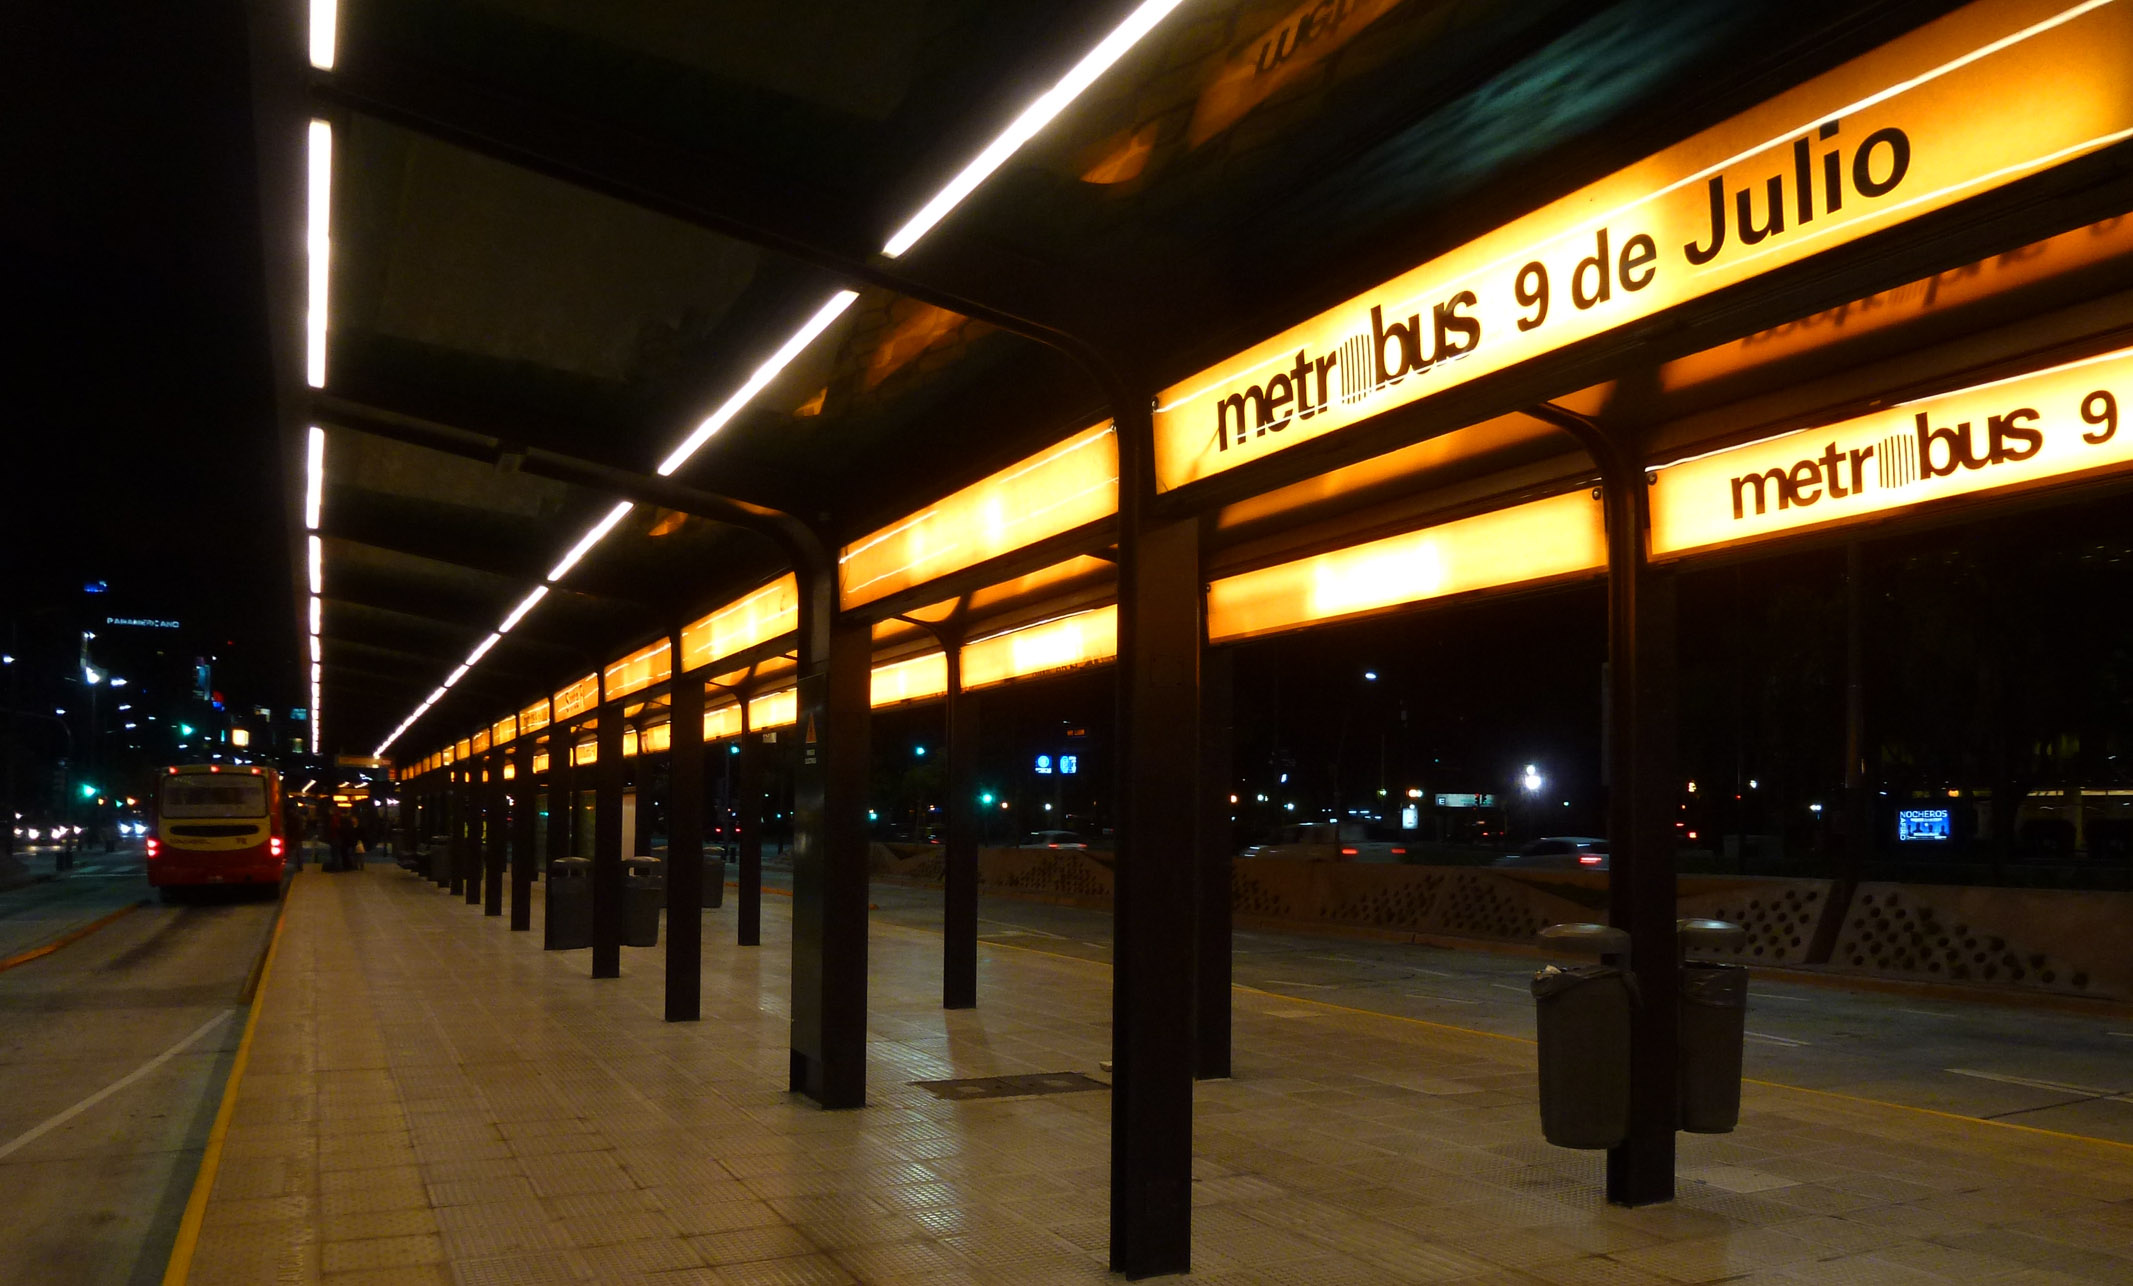 Metrobus-008-9julio.jpg